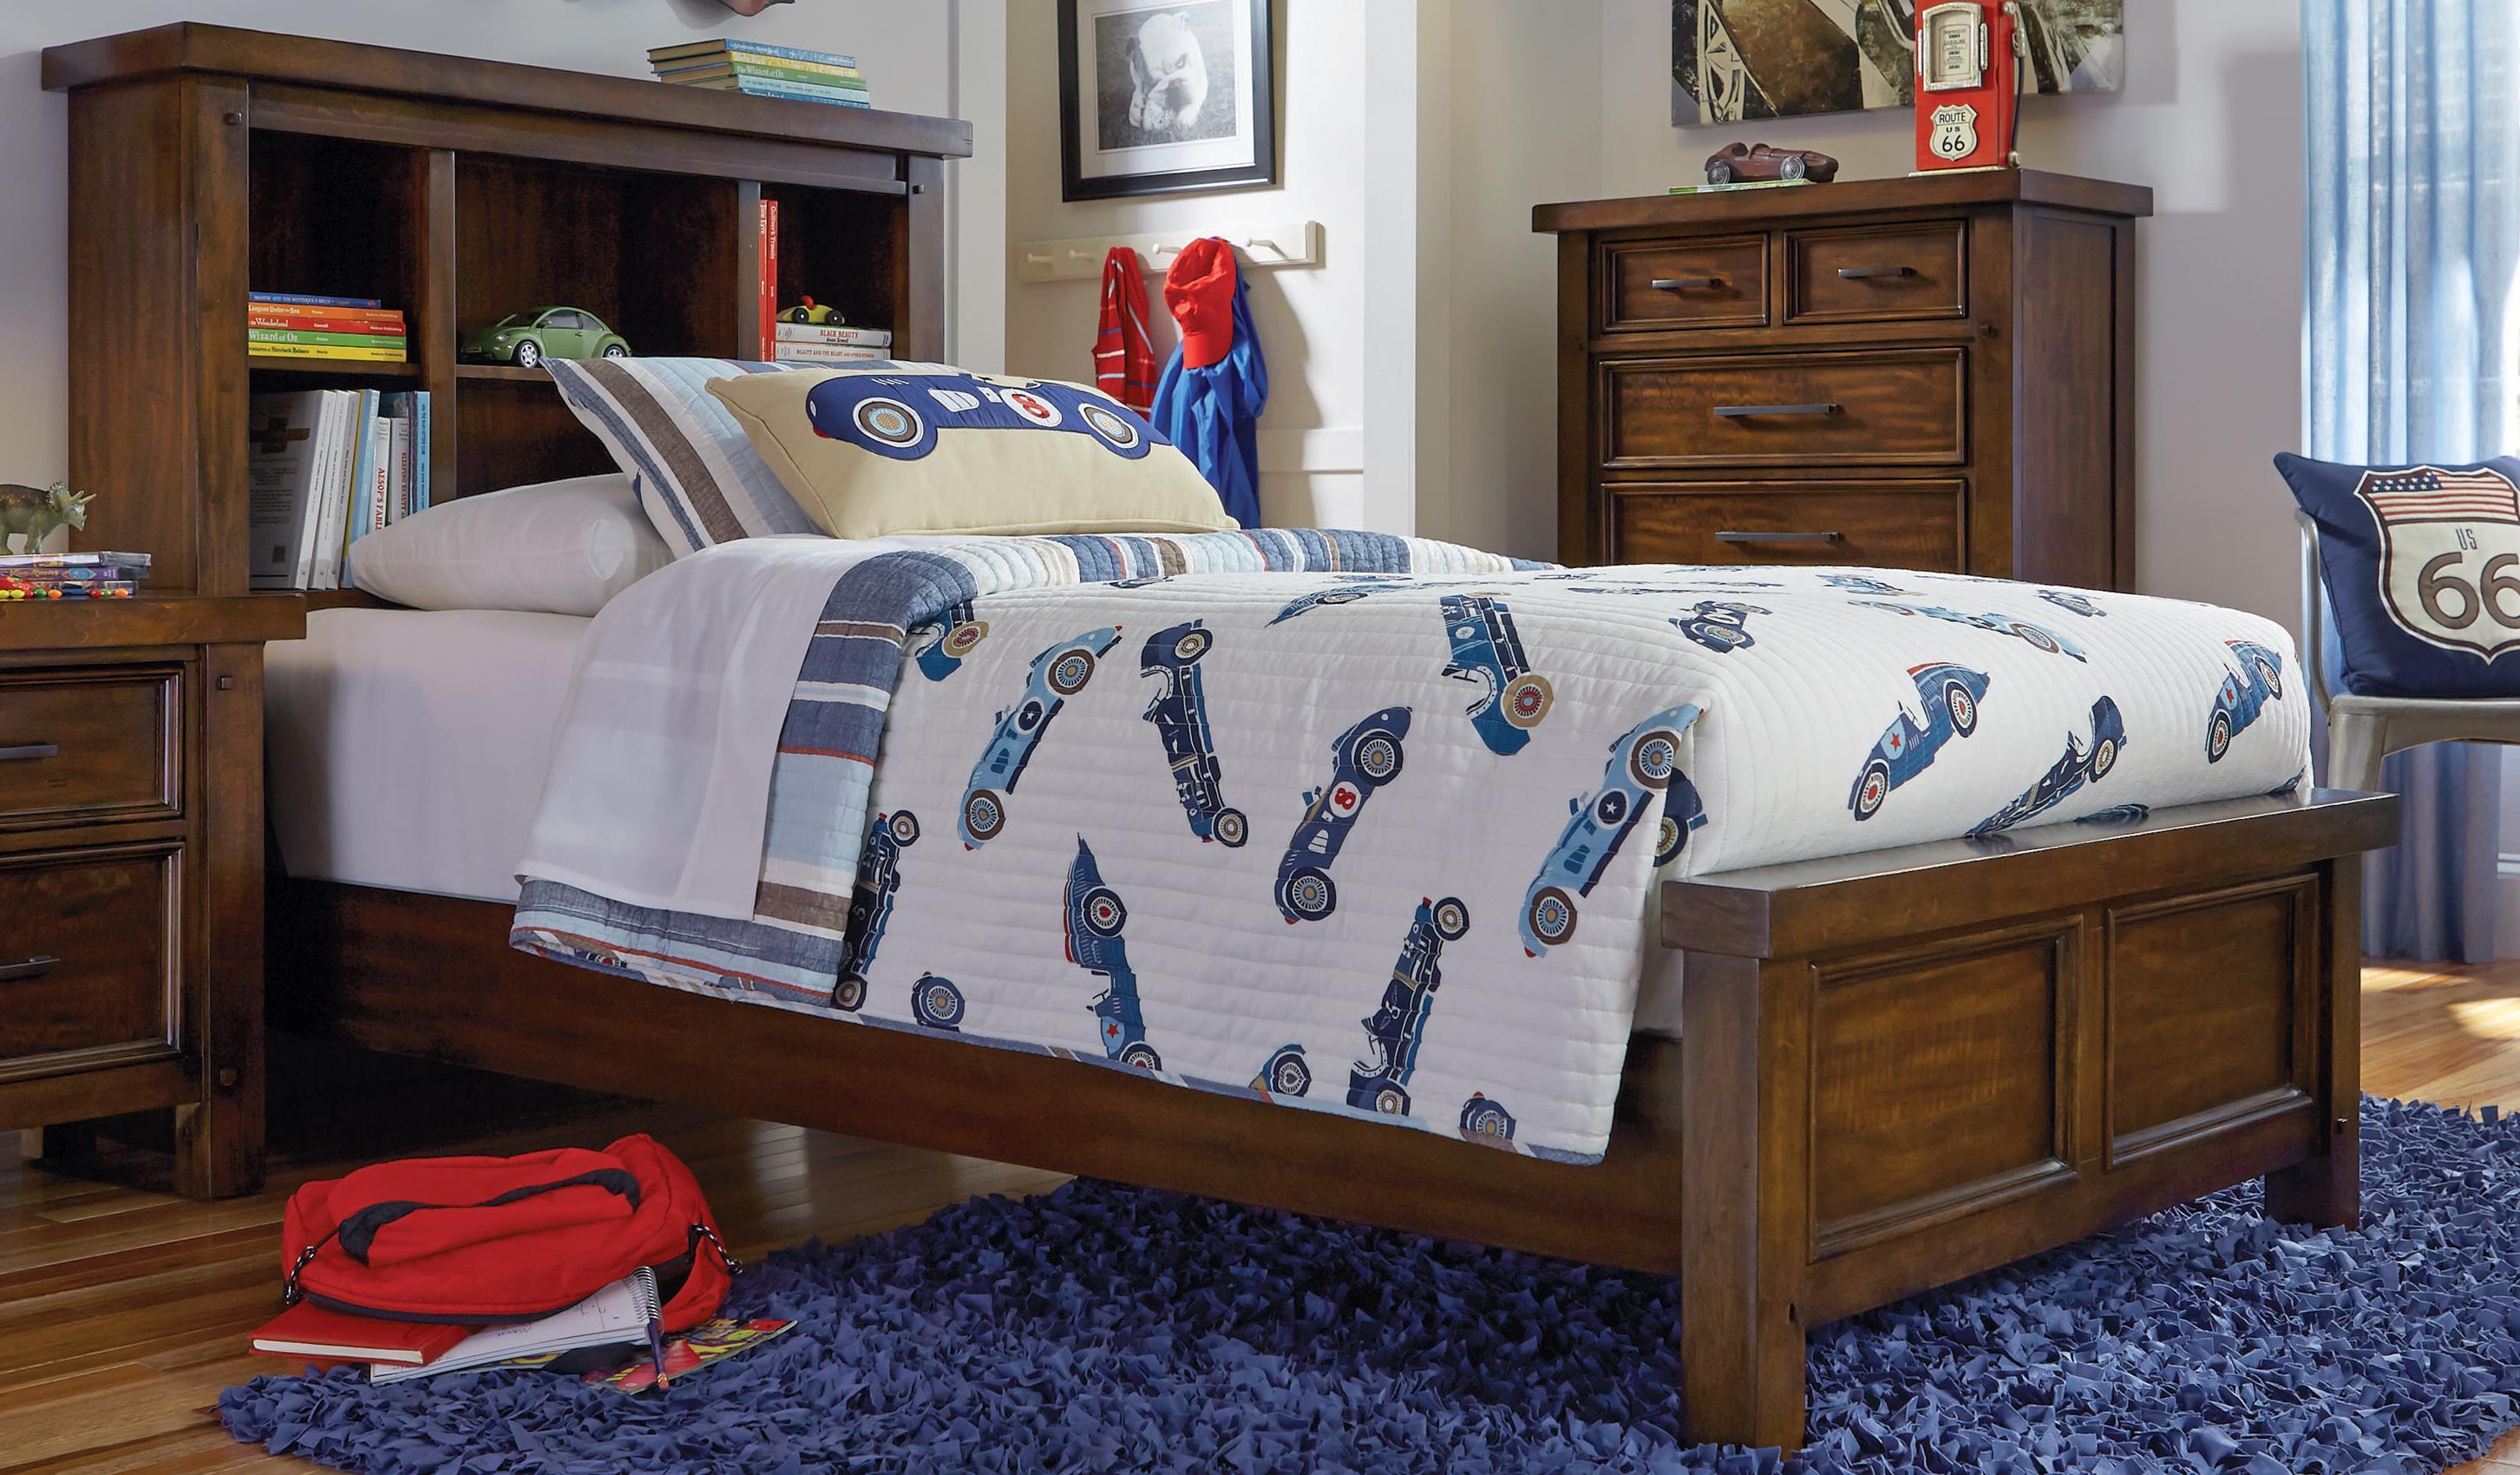 Morris Home Furnishings Sorrento 2688 Sorrento Full Bookcase Bed - Item Number: 475816317